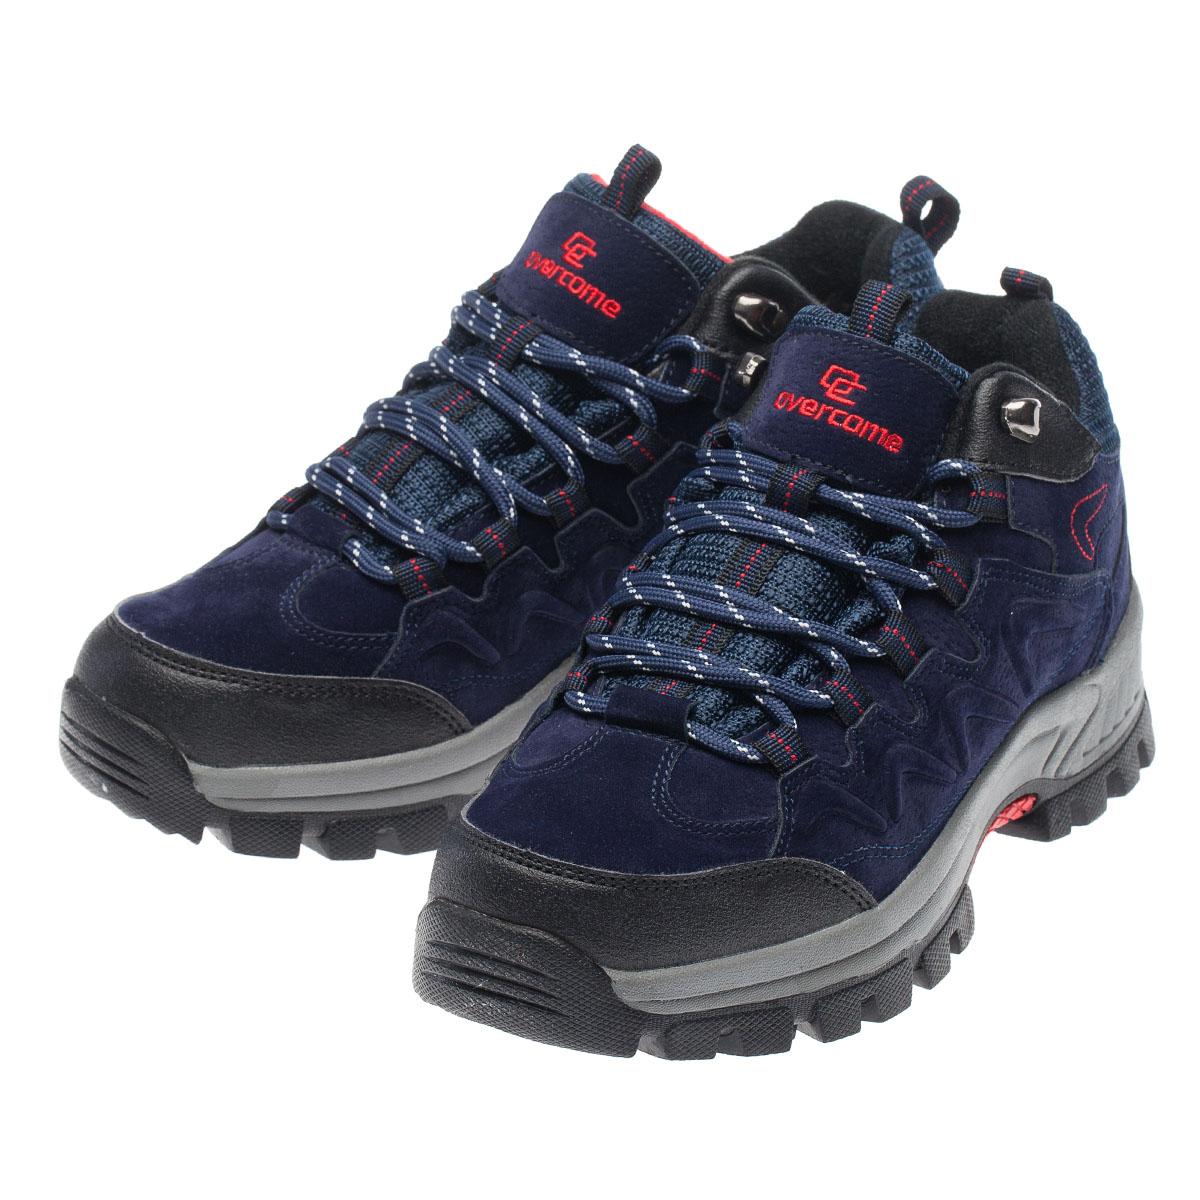 Ботинки зимние Overcome, 36613